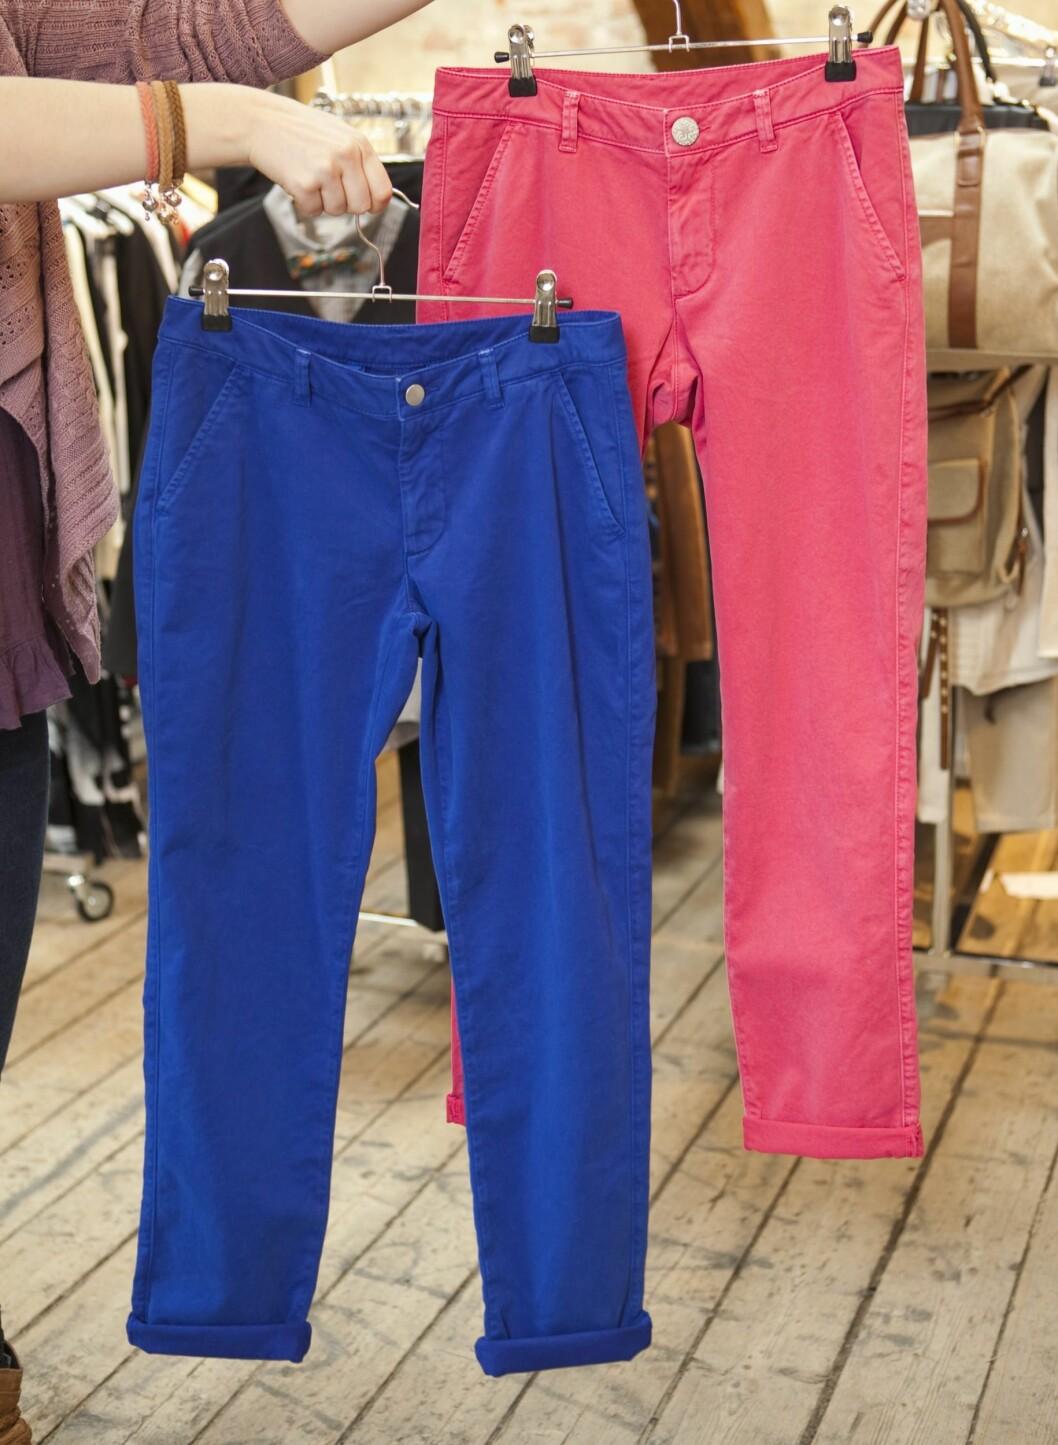 – Jeg elsker farger, og disse buksene kan bli supersøte med en enkel, hvit silkebluse med knytting i halsen og et par lekre pumps.   Bukser fra Lindex, kr 300. Foto: Per Ervland